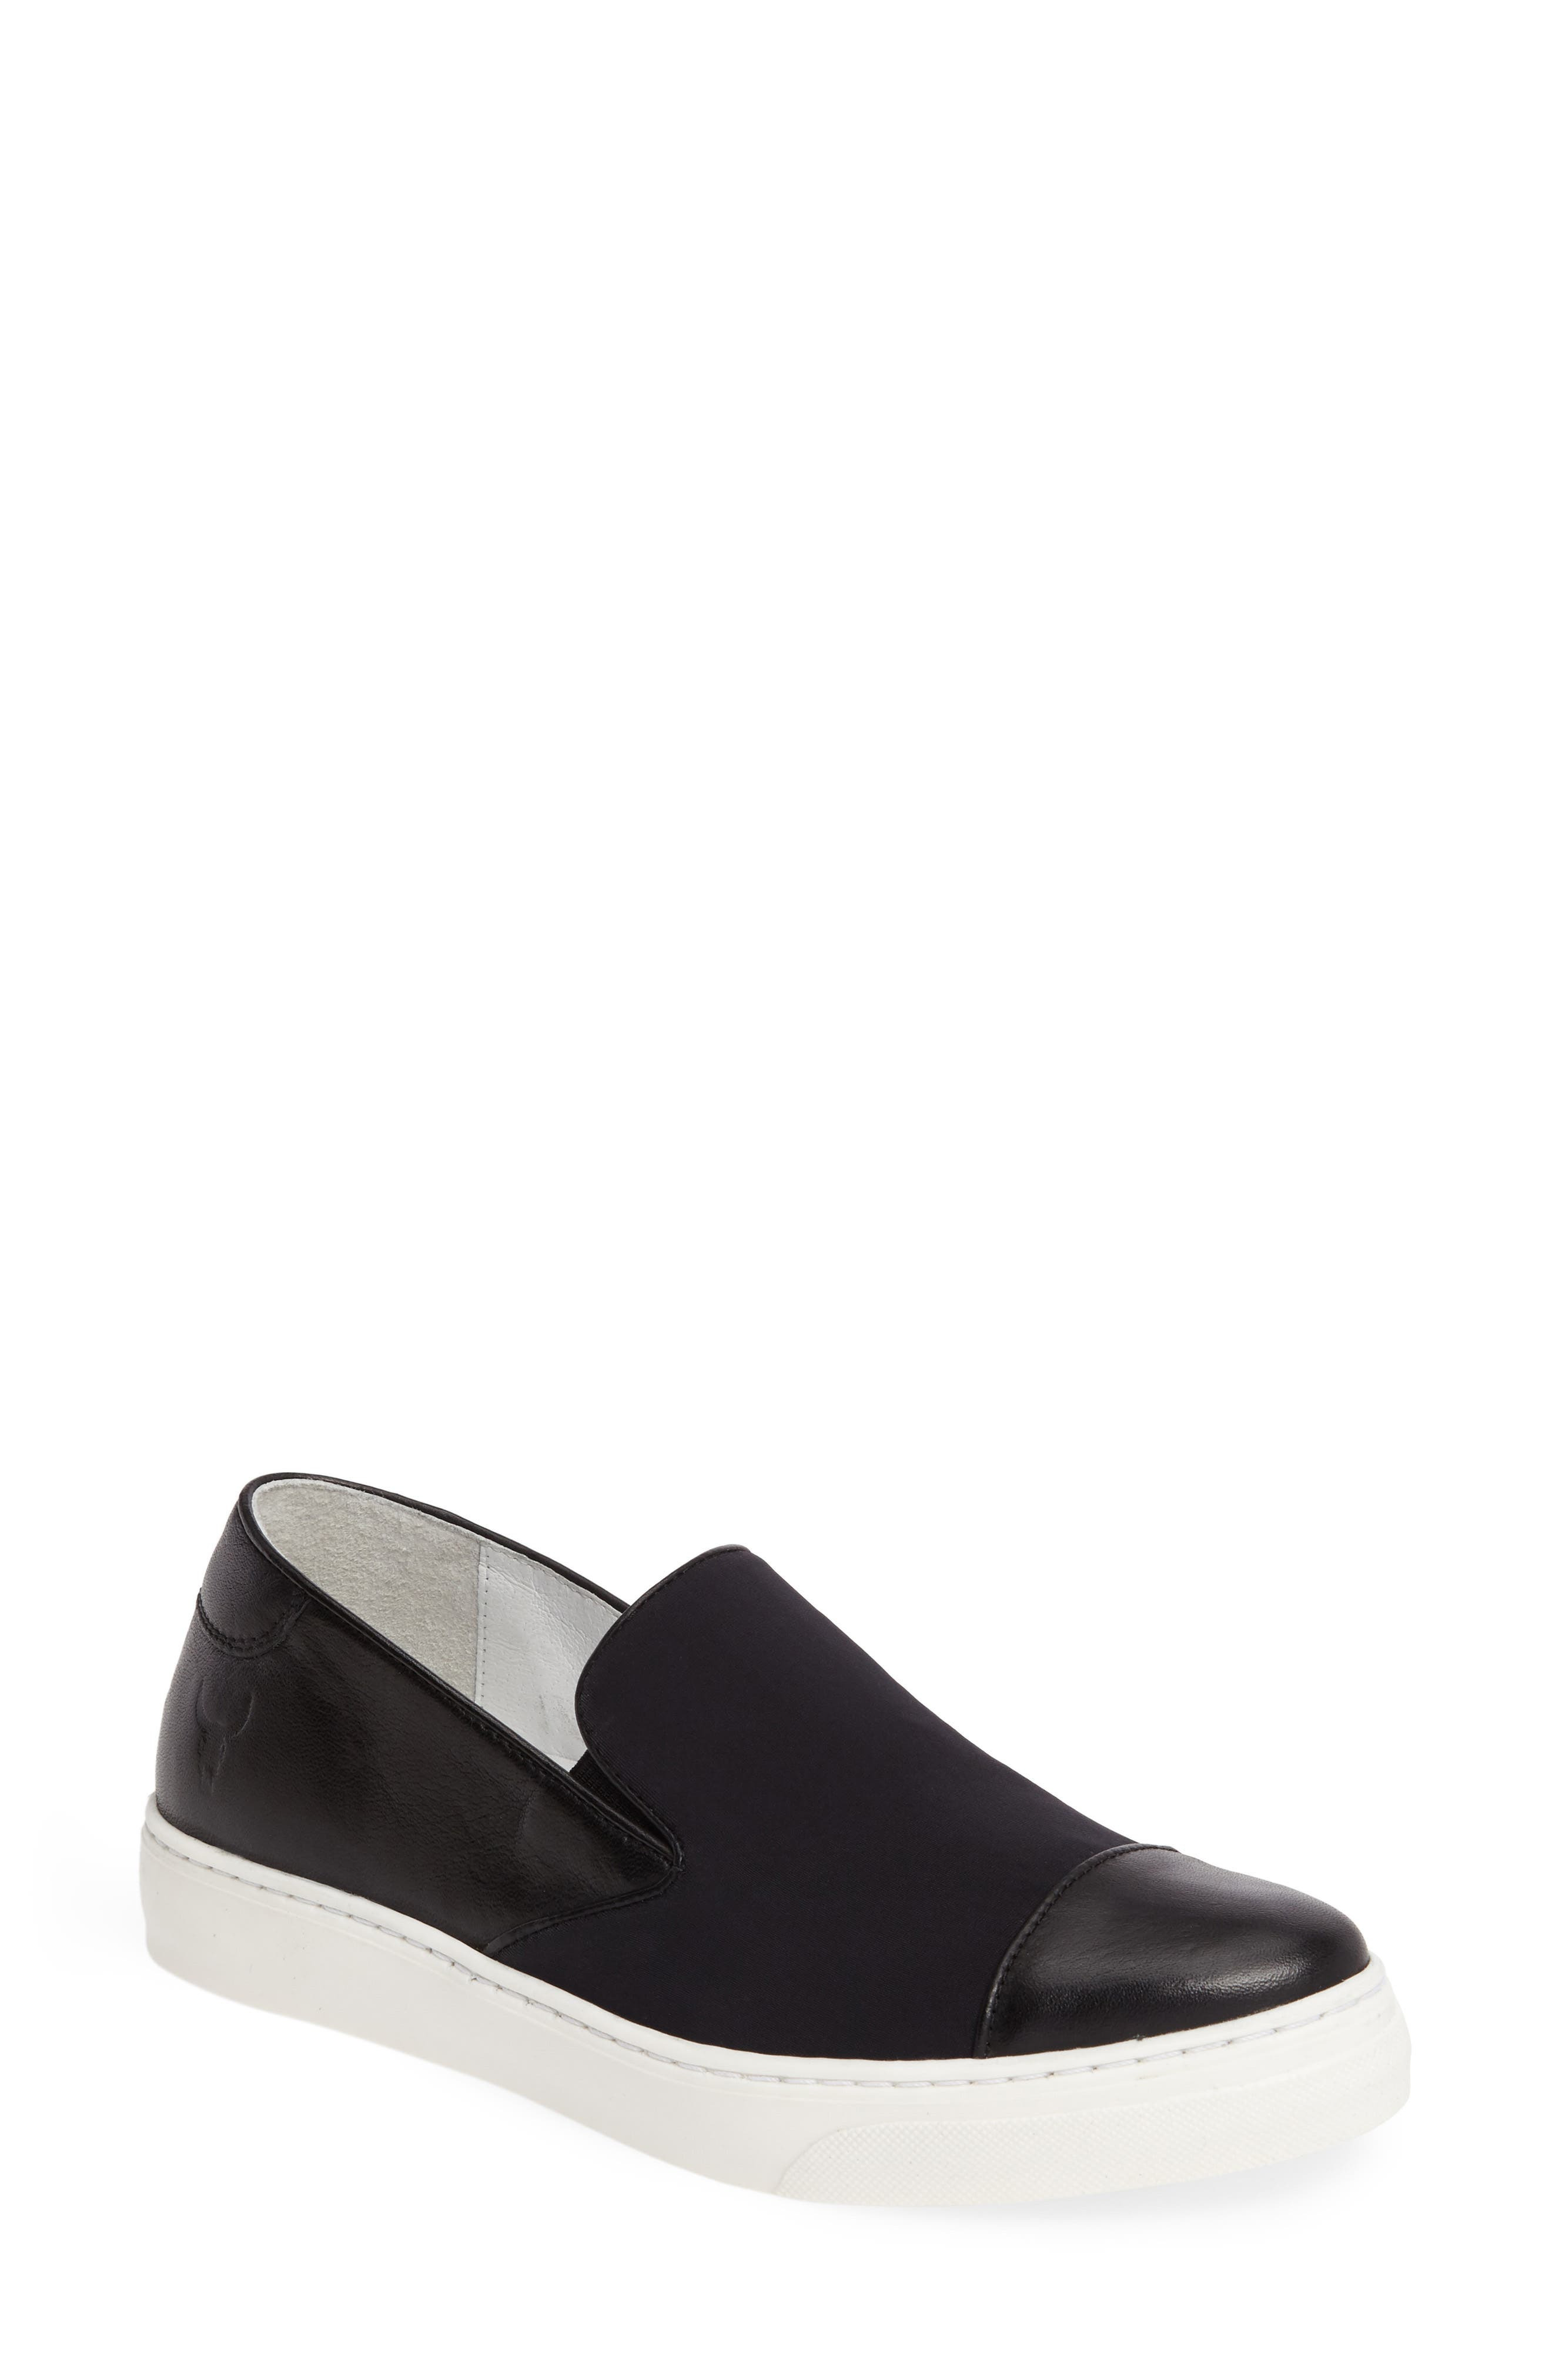 Betsy Slip-On Sneaker,                         Main,                         color, 001